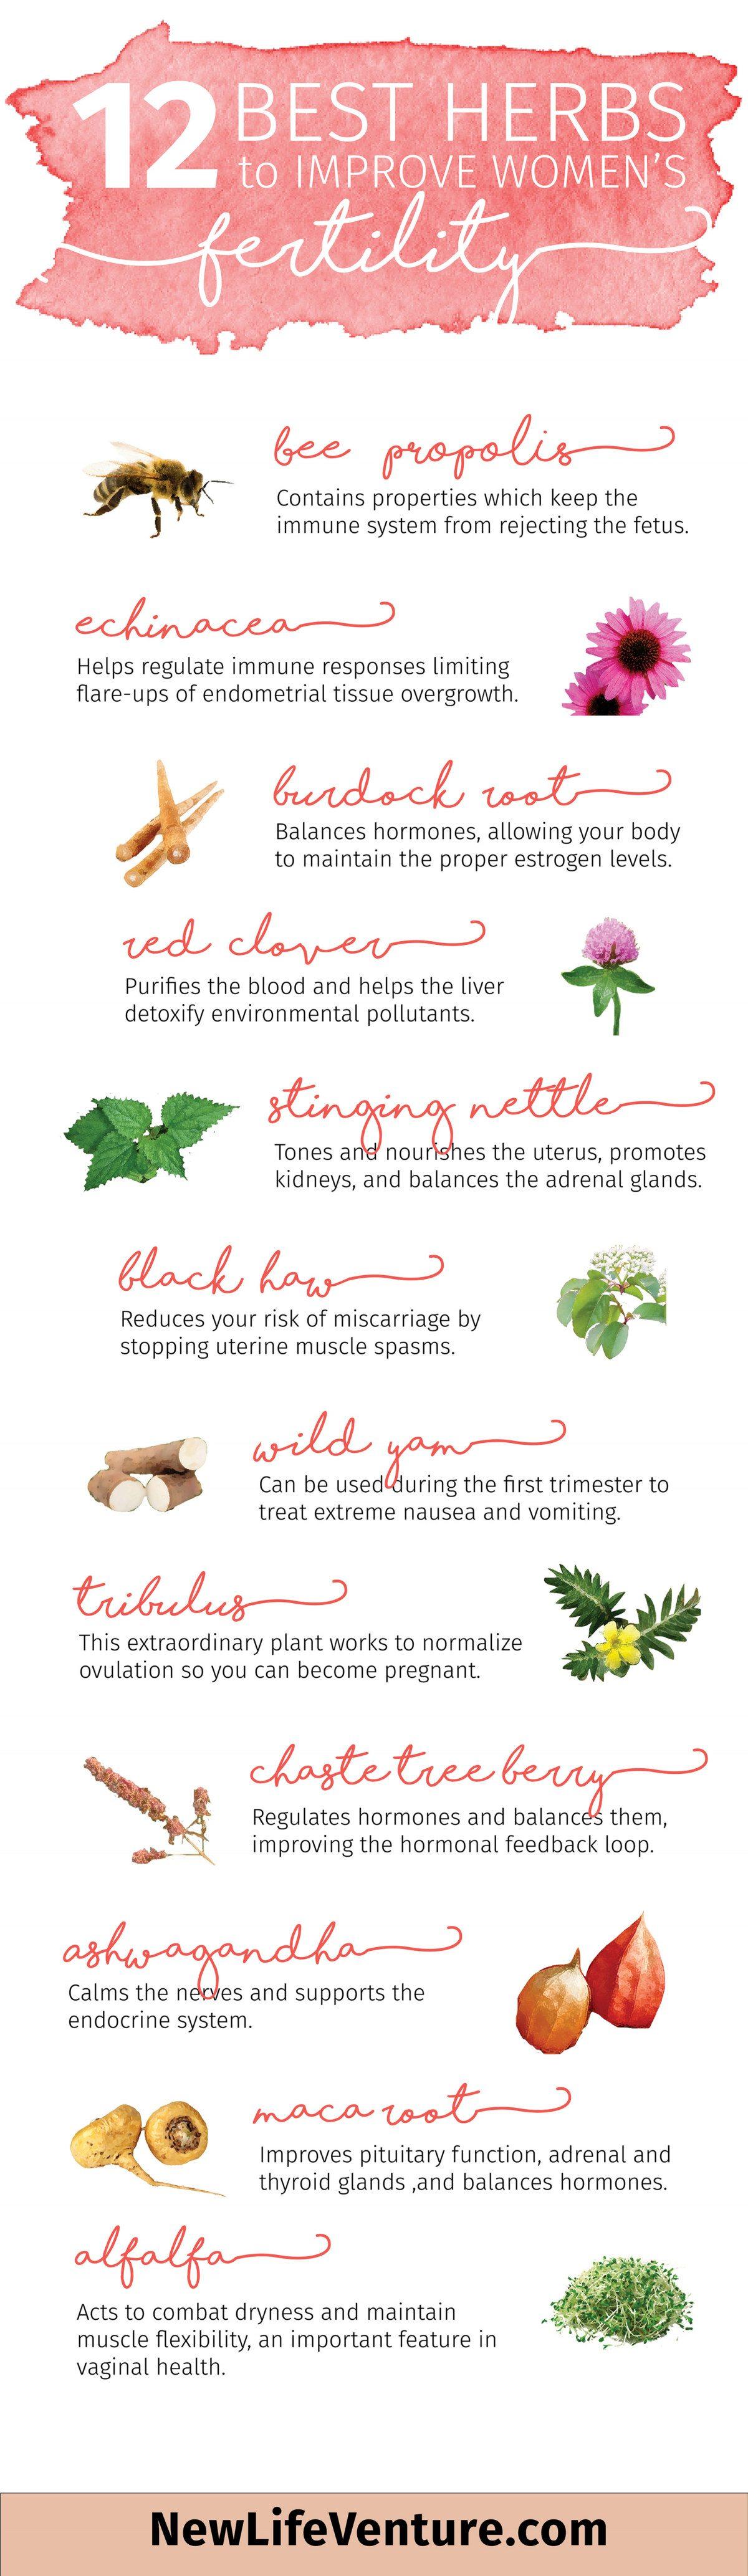 herbs to improve women fertility